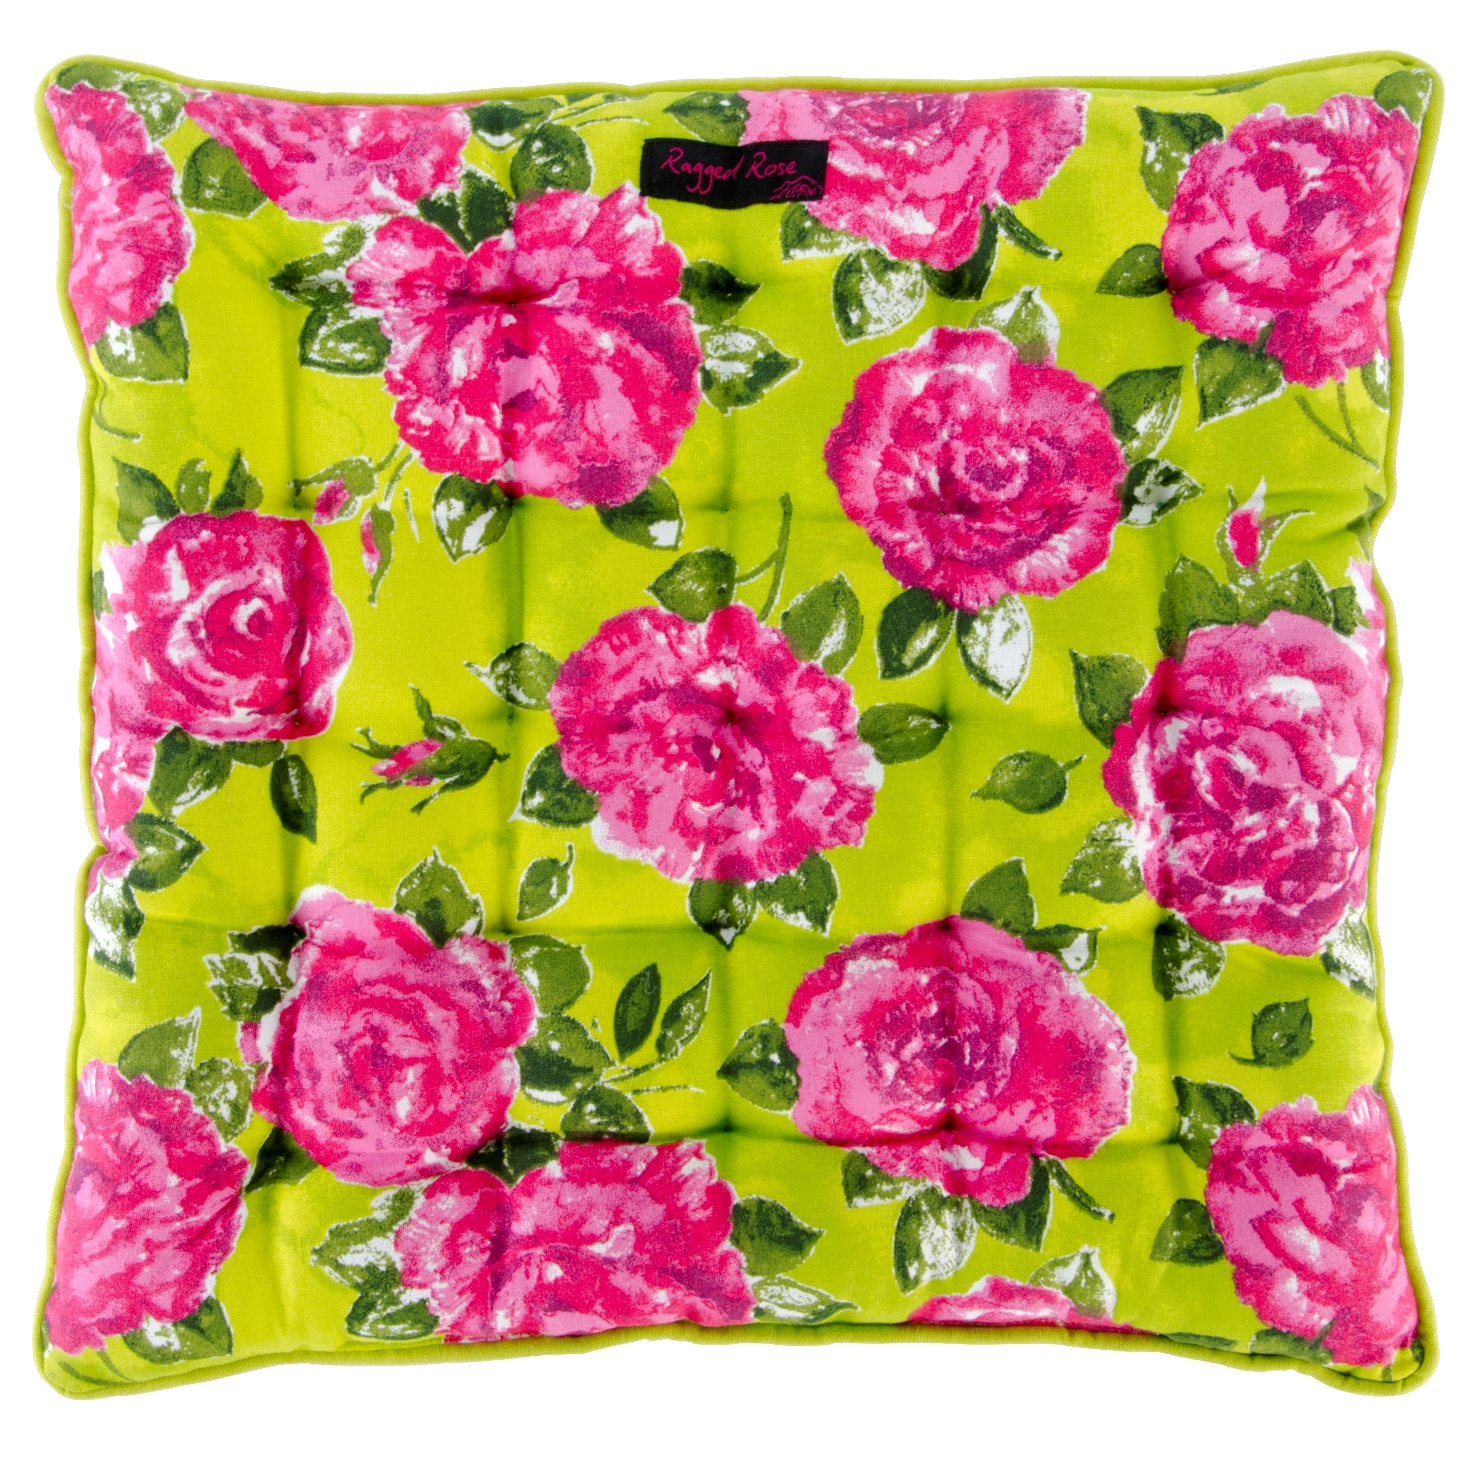 Lime & Rose Seat Pad Cushion ~ €21.50